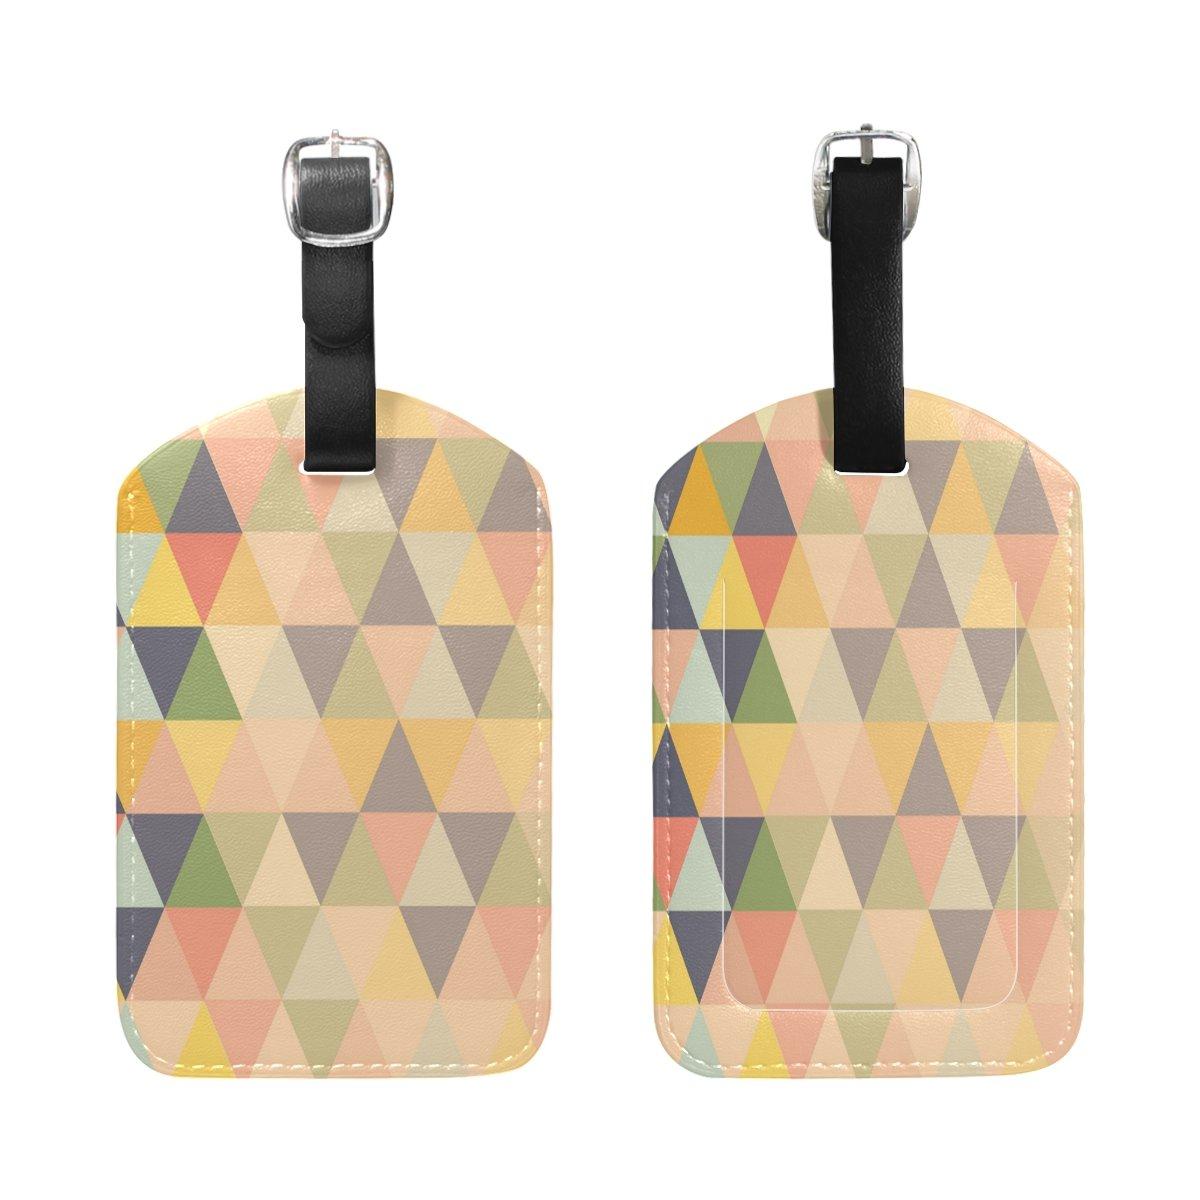 1Pcs Saobao Travel Luggage Tag Colorful Mosaic Illustration PU Leather Baggage Suitcase Travel ID Bag Tag